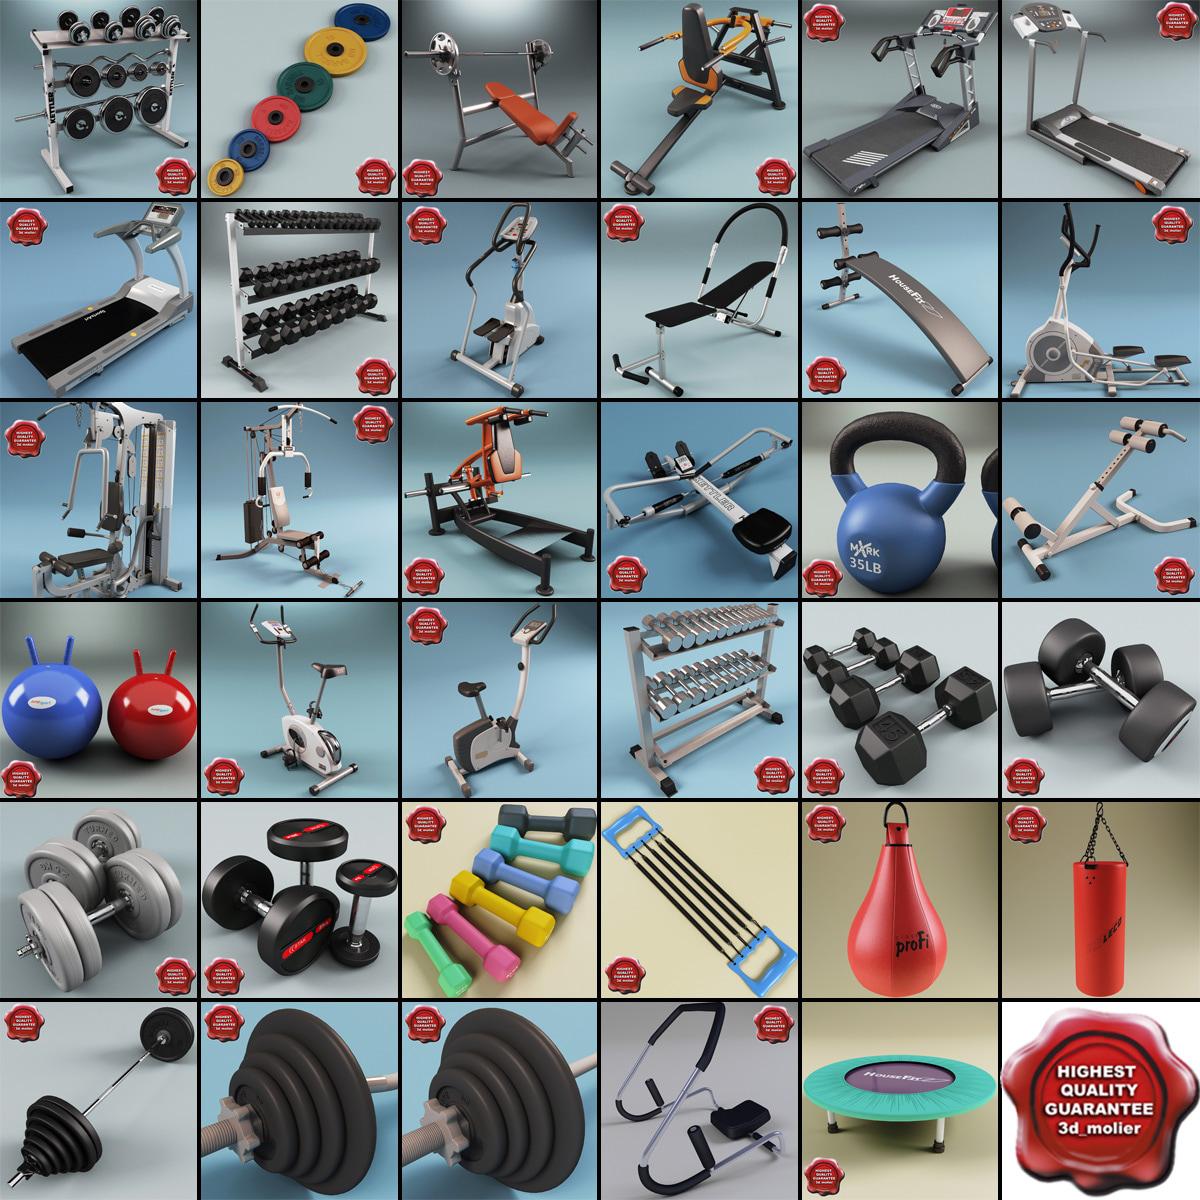 3ds gym equipment v7